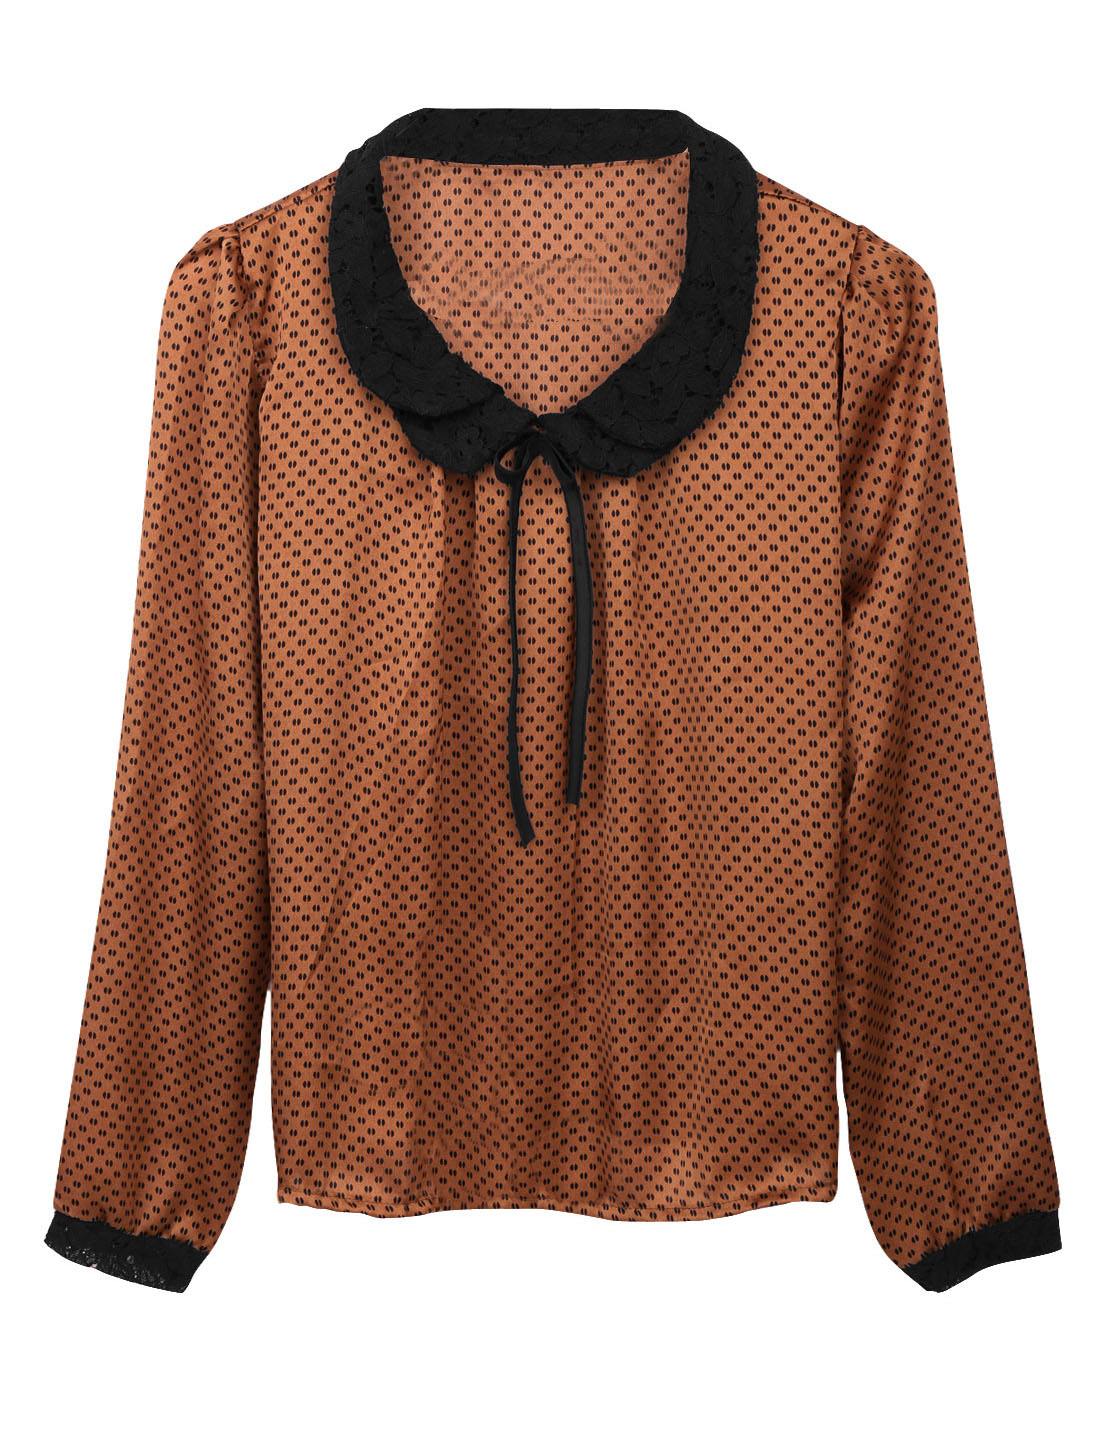 Women Summer Cozy Fit Lace Splice Detail Dots Pattern Top Brown XL